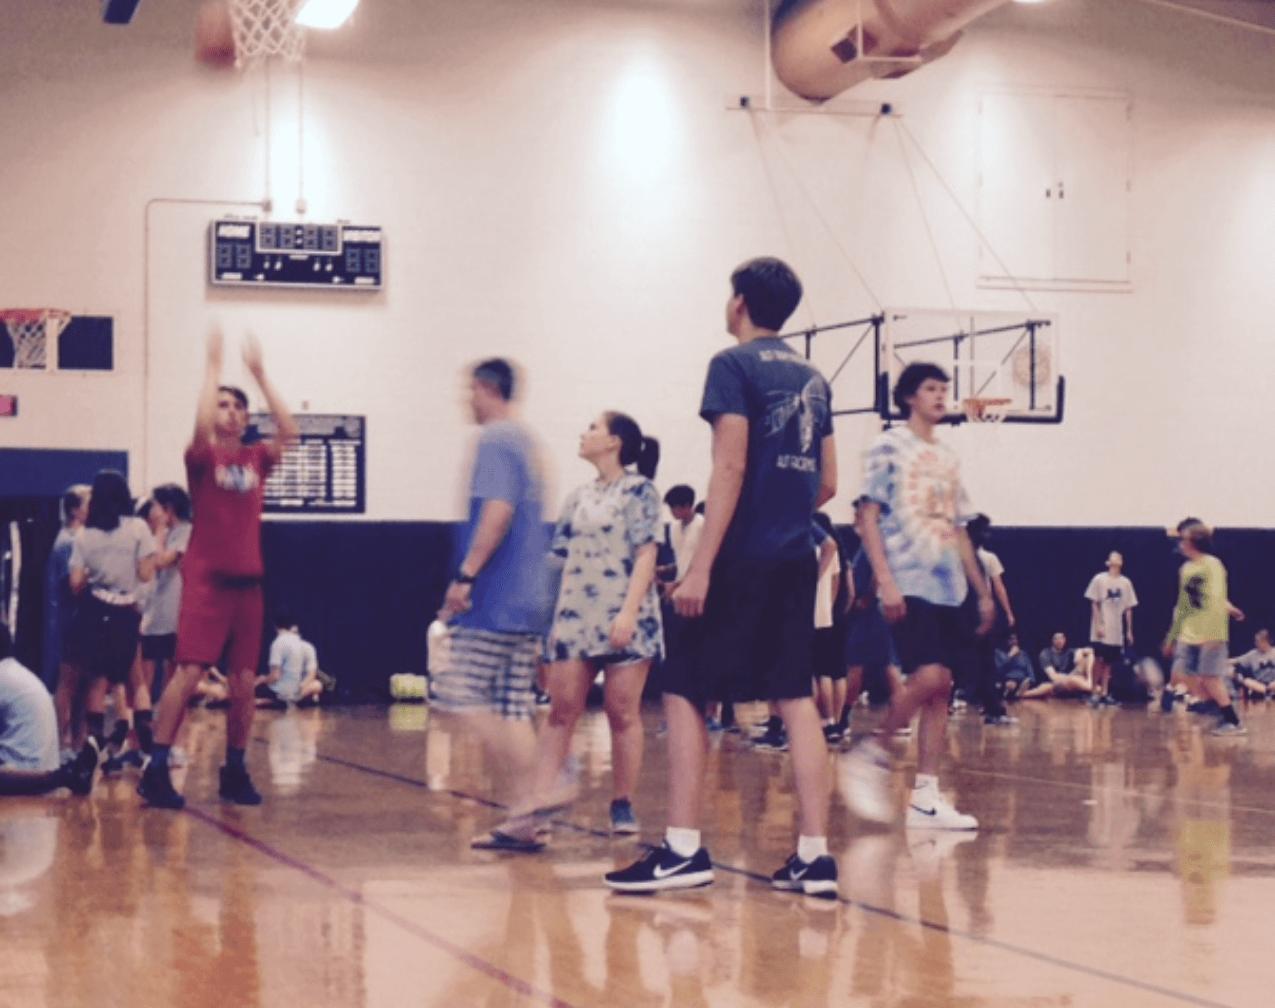 A fierce game of basketball.